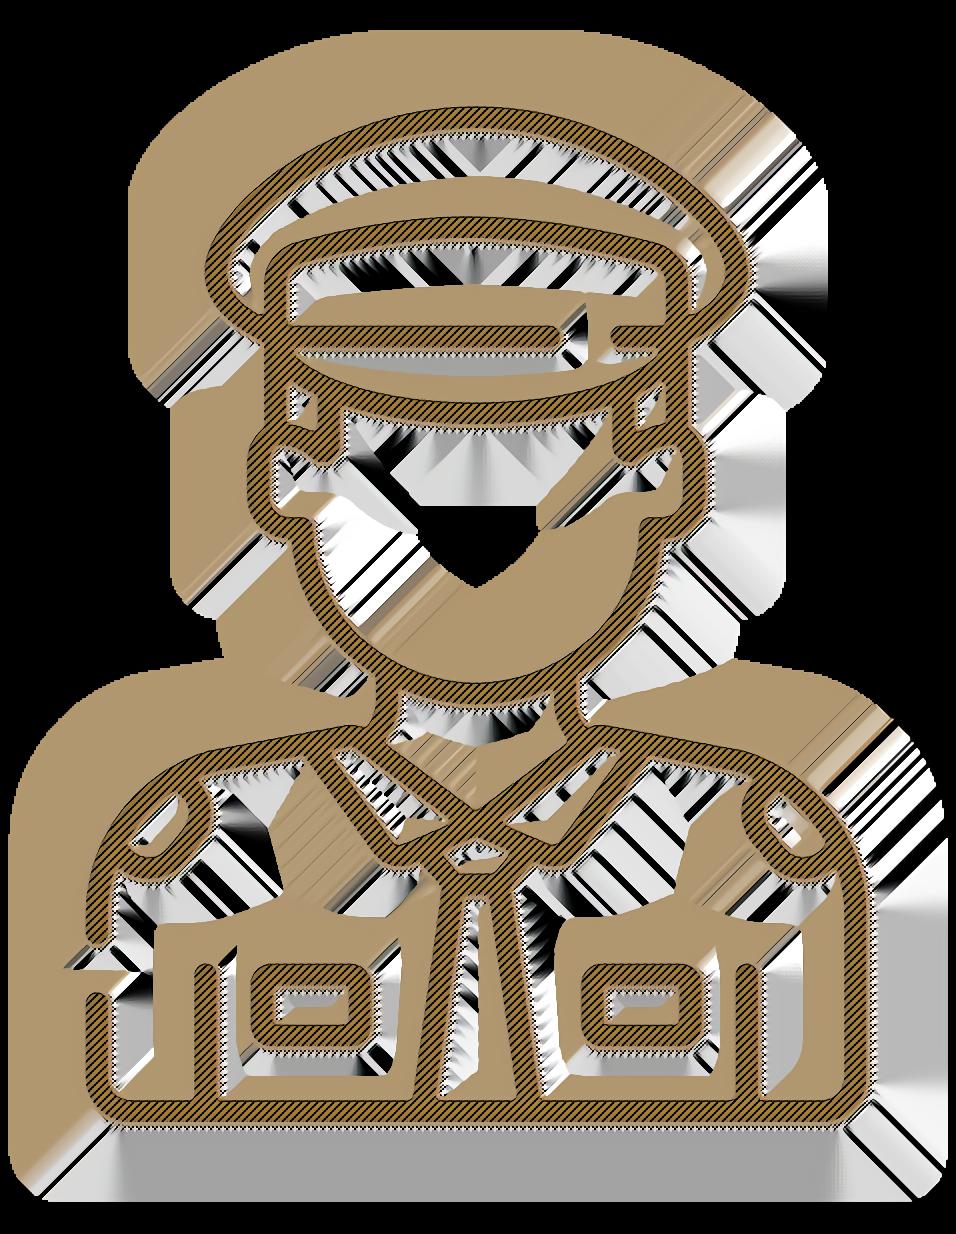 kissclipart-policeman-icon-crime-investigation-icon-61862058e8b8ba82